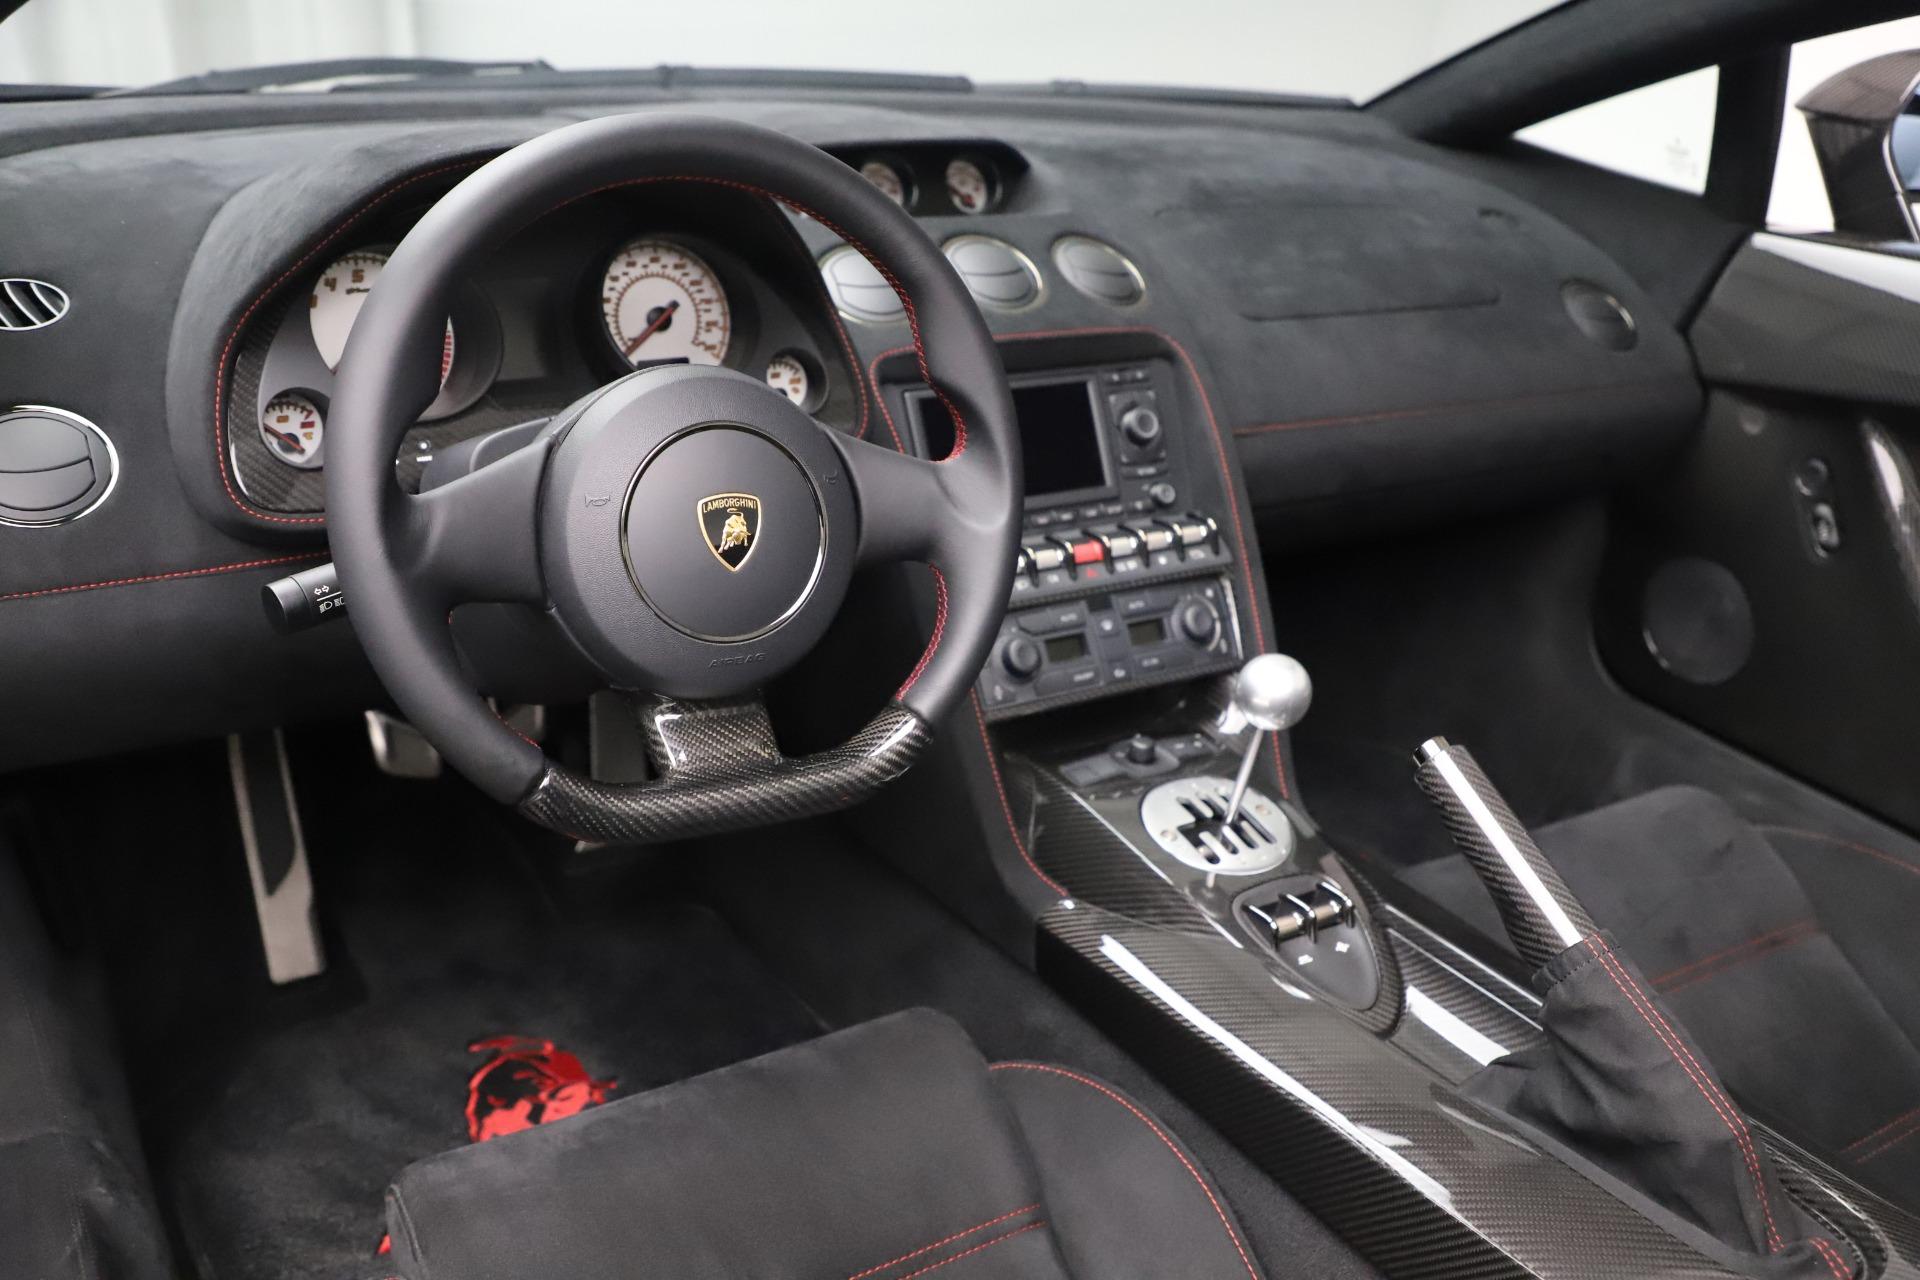 Used-2013-Lamborghini-Gallardo-LP-570-4-Spyder-Performante